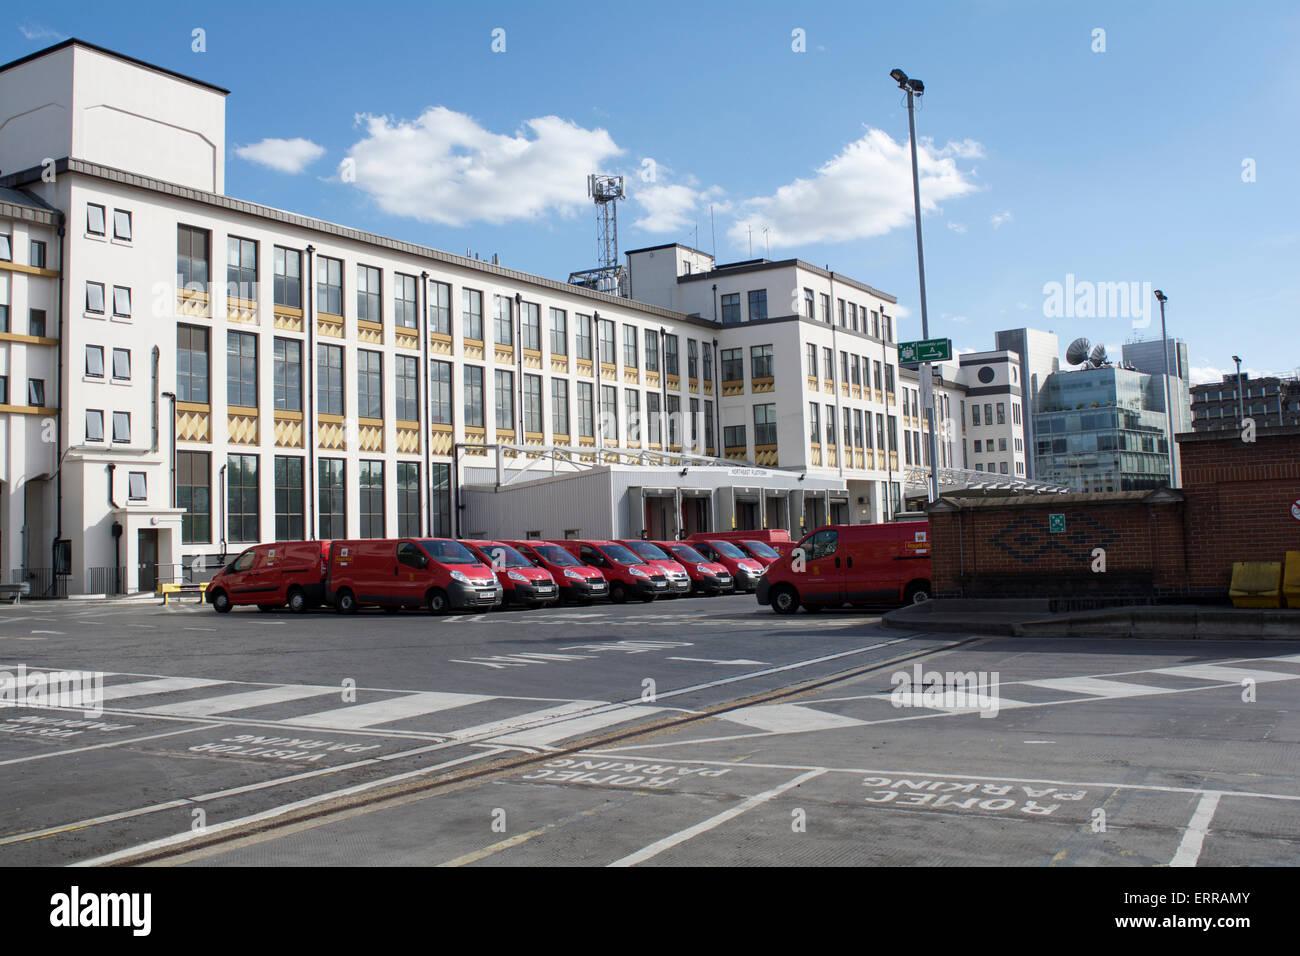 The Mount Pleasant Mail Centre, Farringdon Road, London, EC1, UK - Stock Image